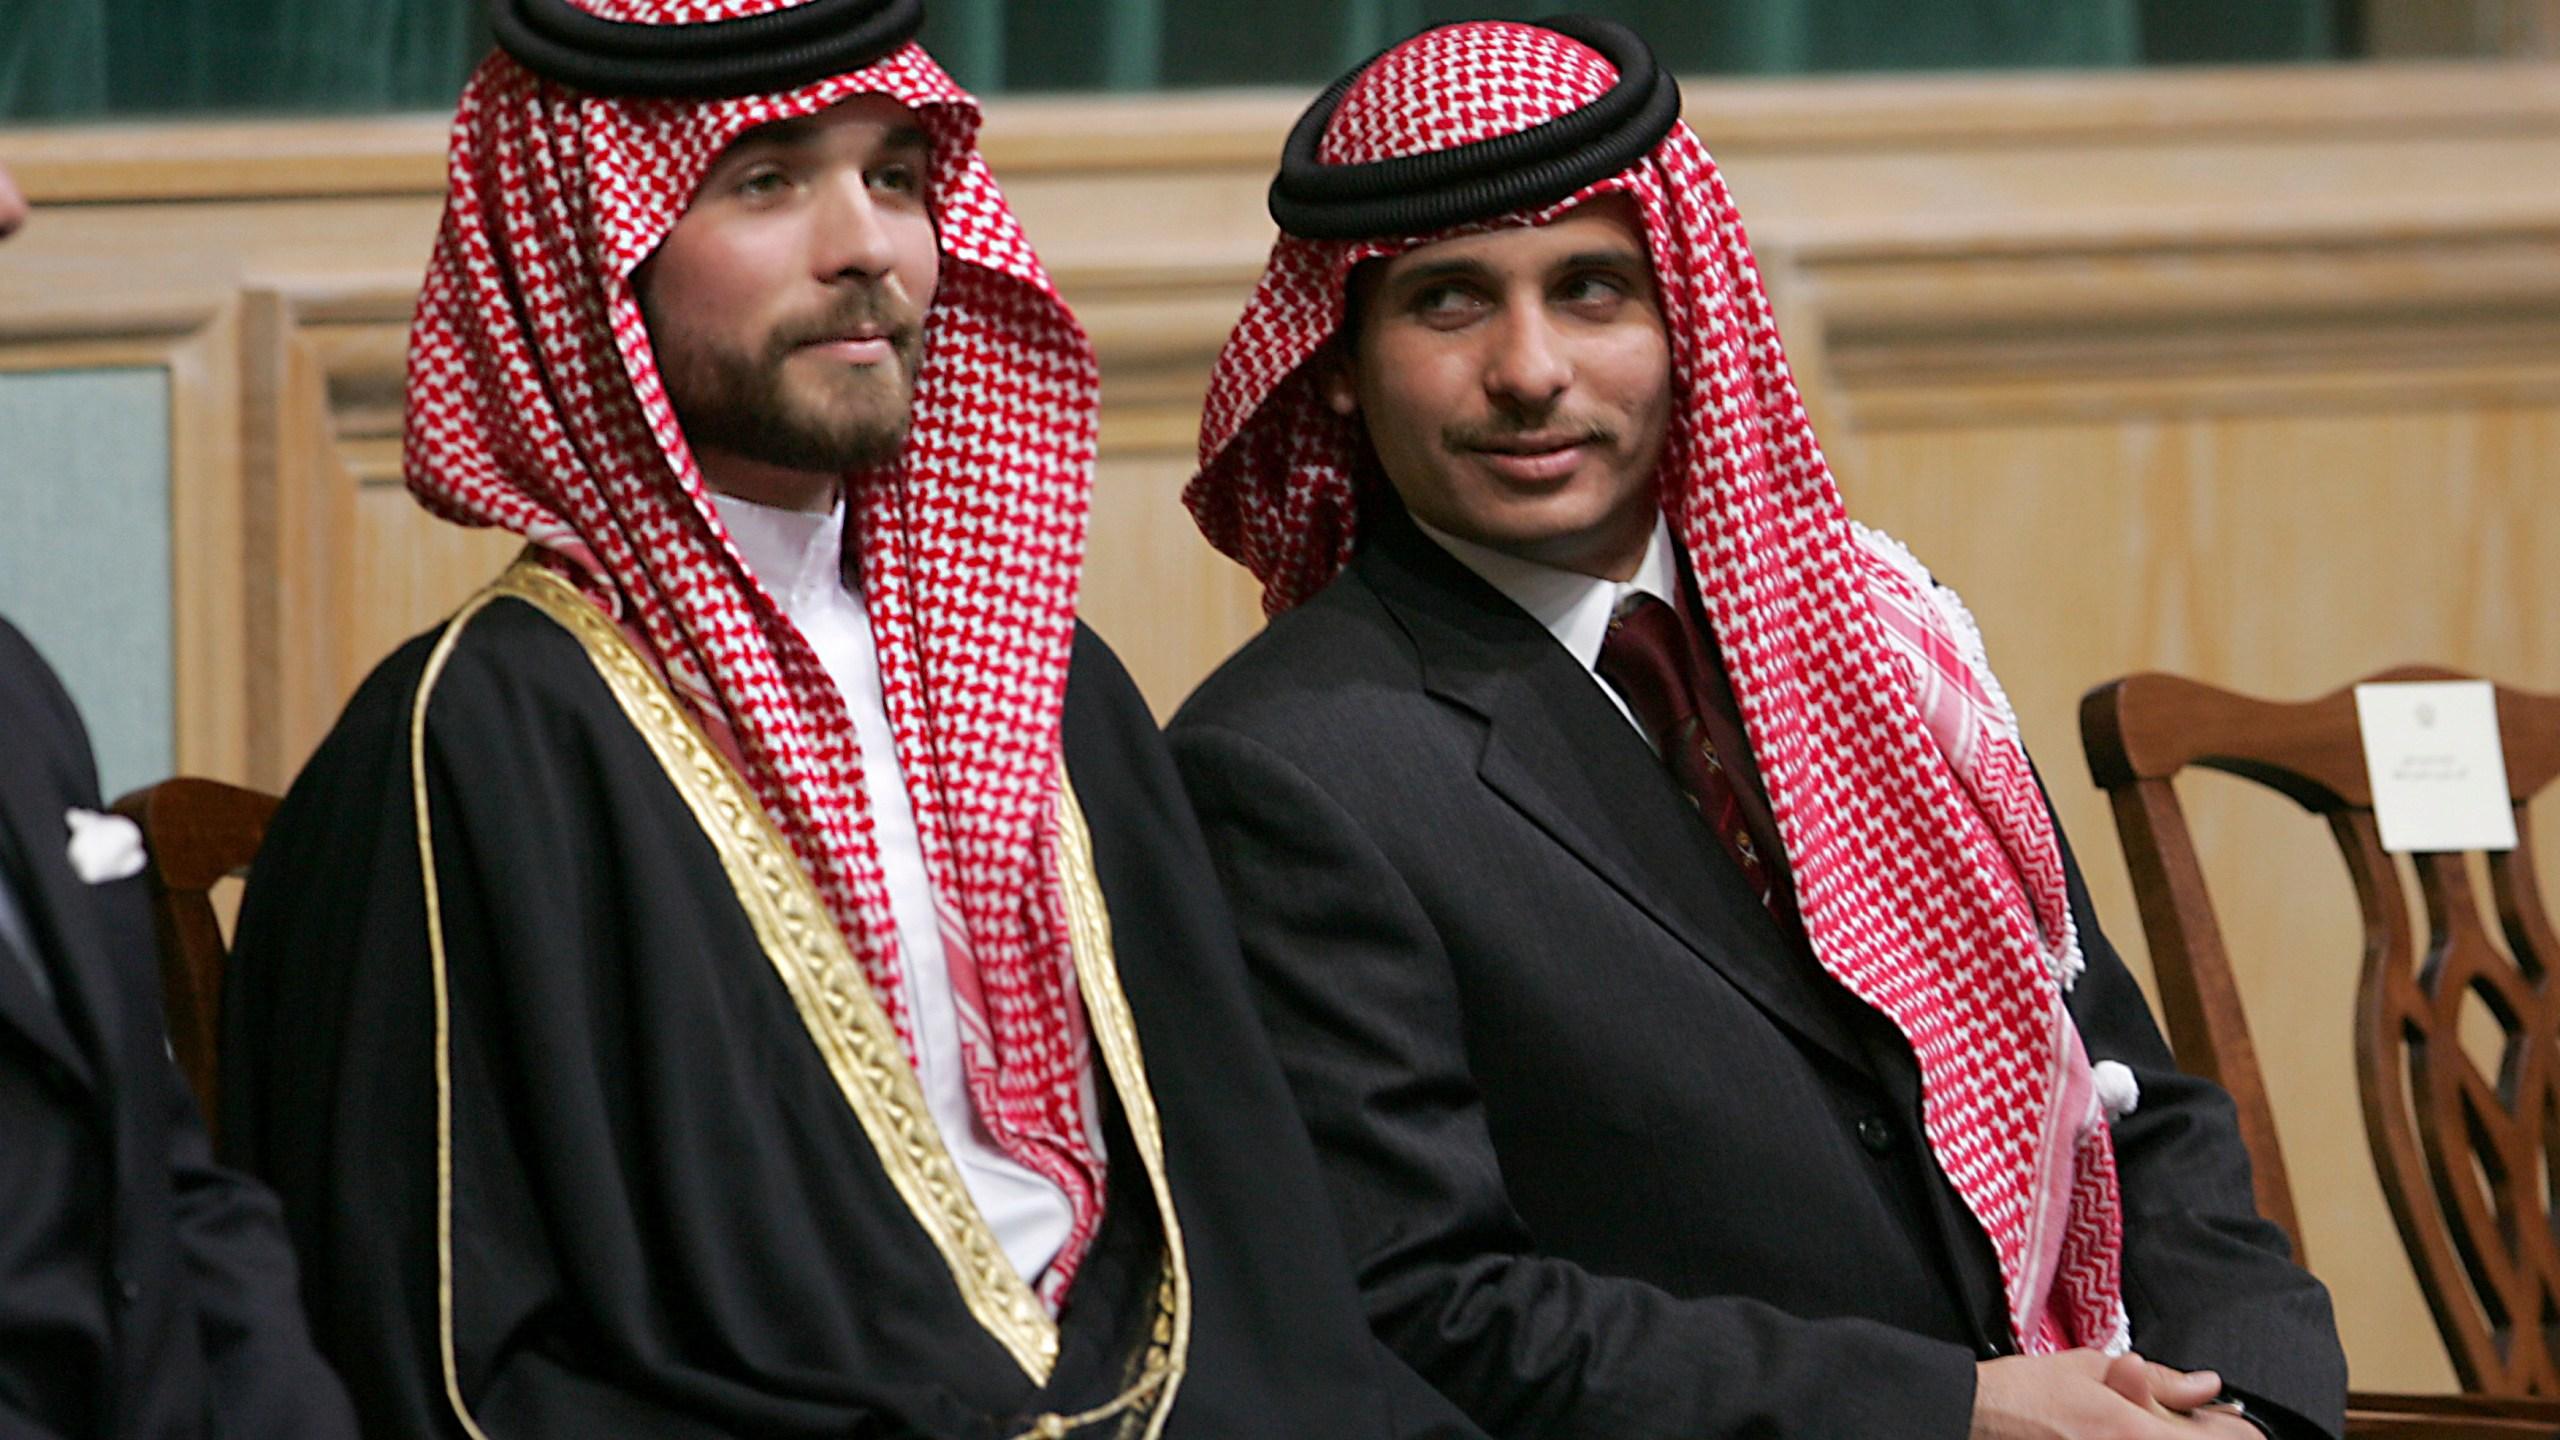 Prince Hamzah Bin Al-Hussein, Prince Hashem Bin Al-Hussein